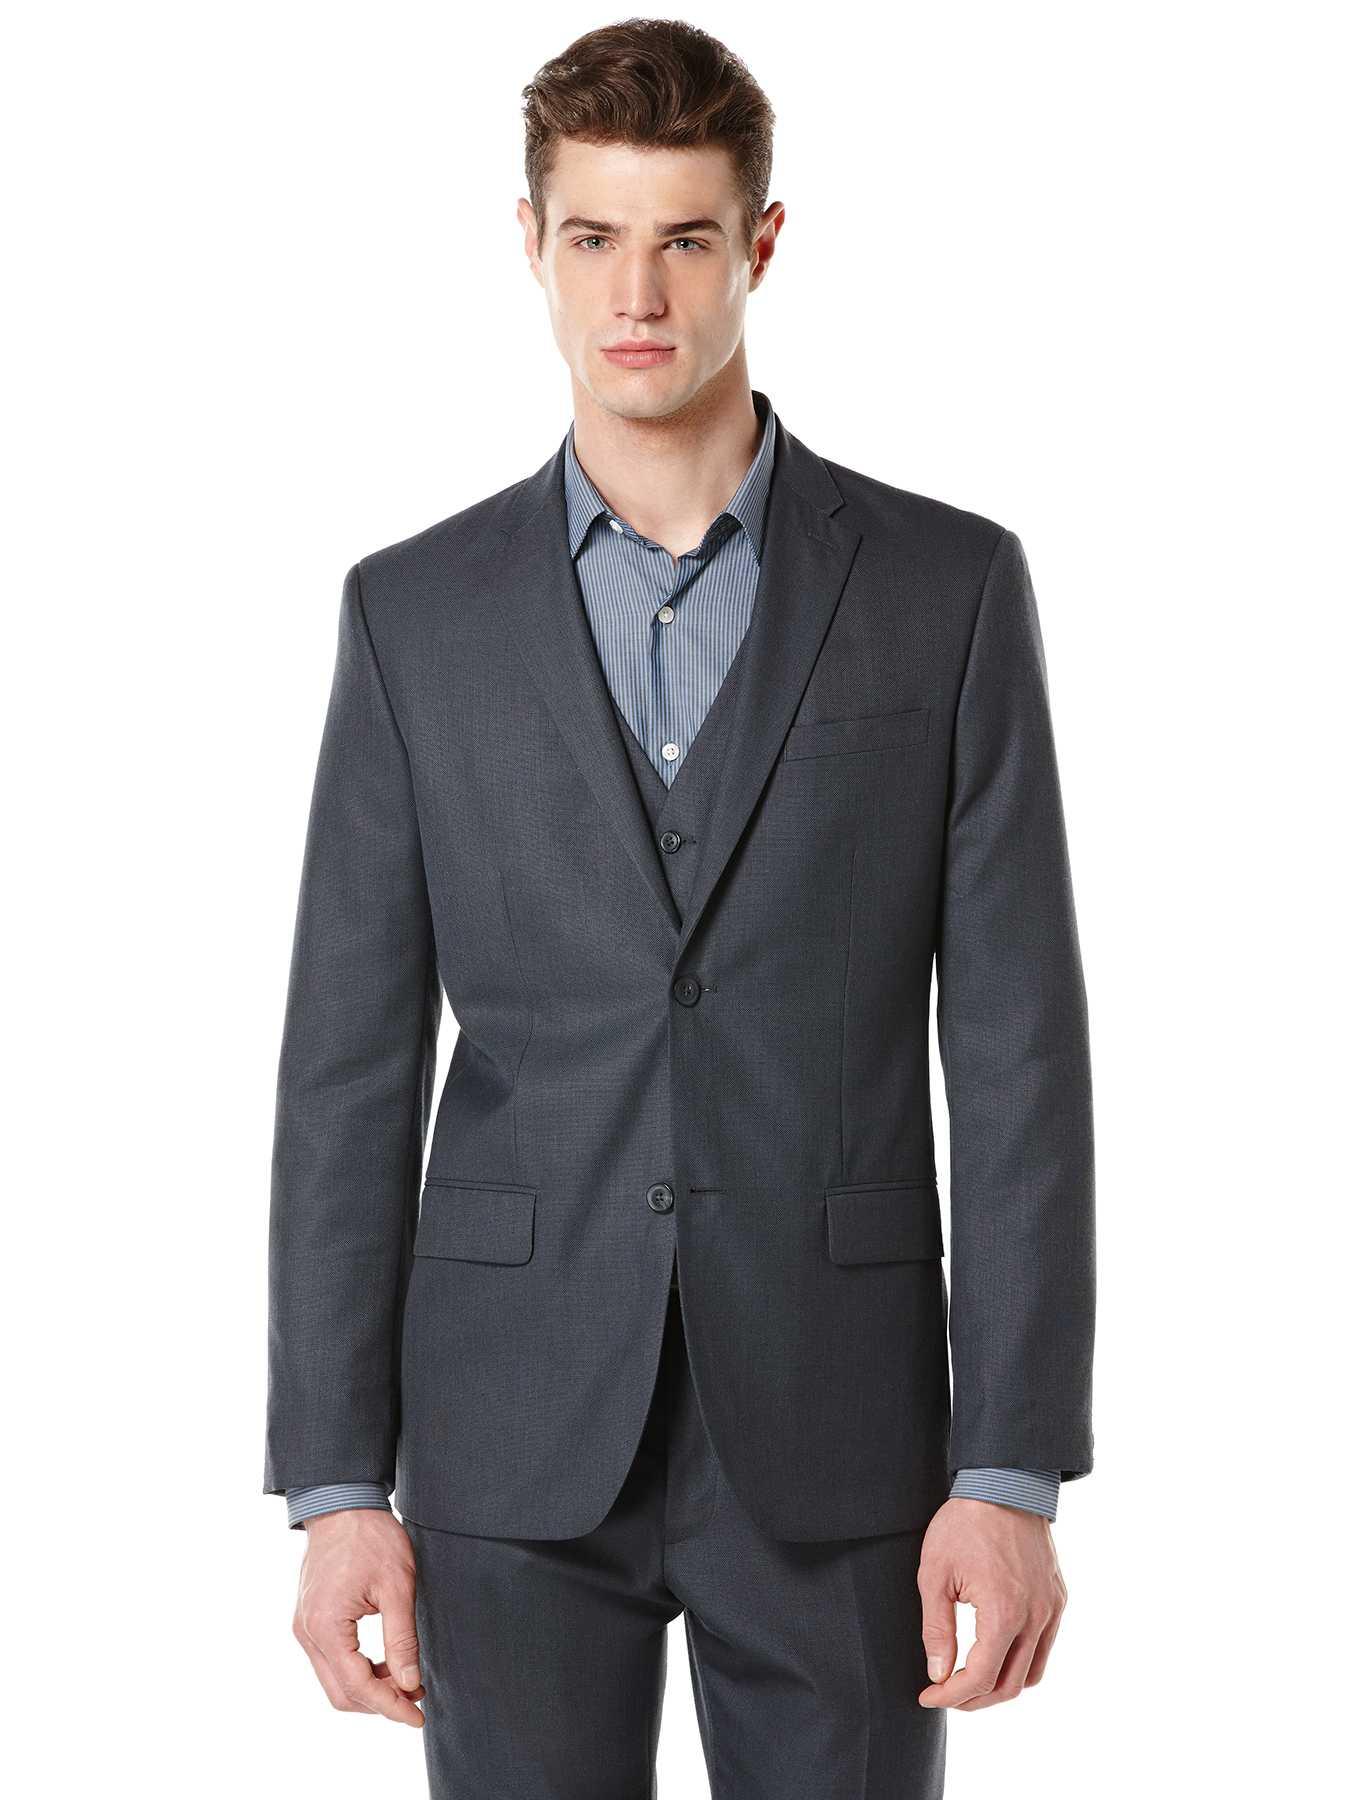 Perry Ellis Regular Fit Textured Fabric Suit Jacket